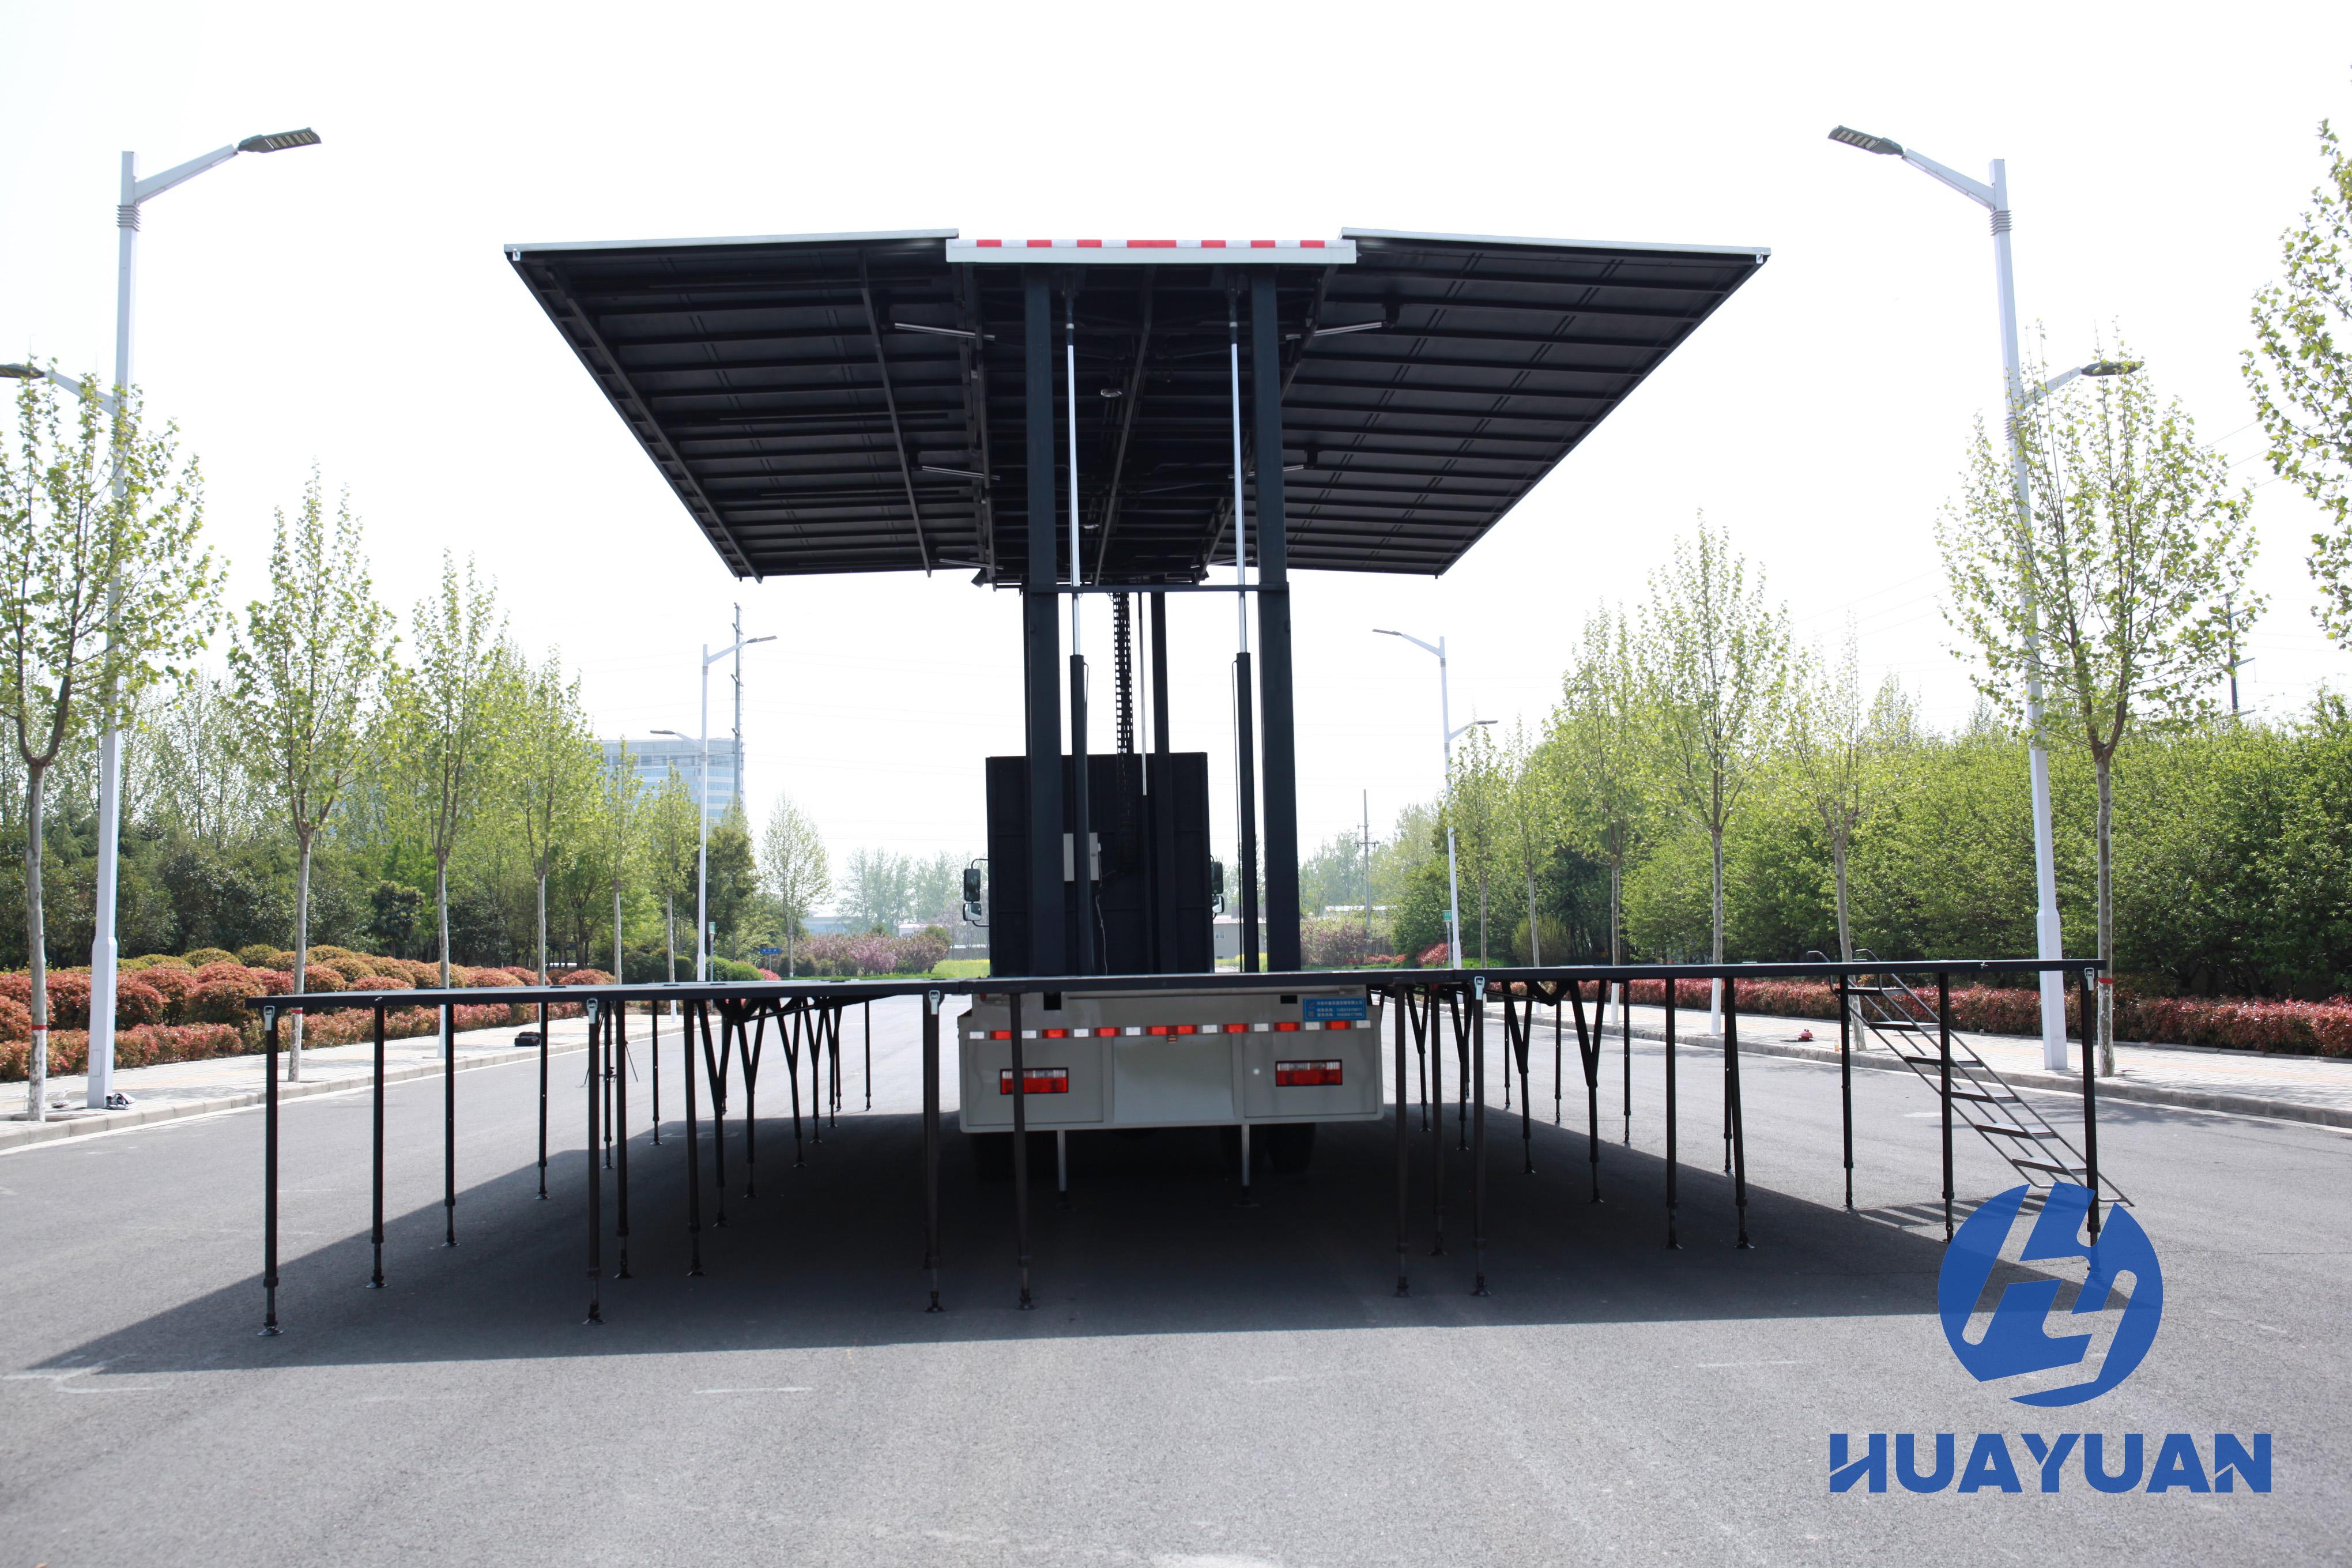 HY-stage-truck 1 (11).JPG